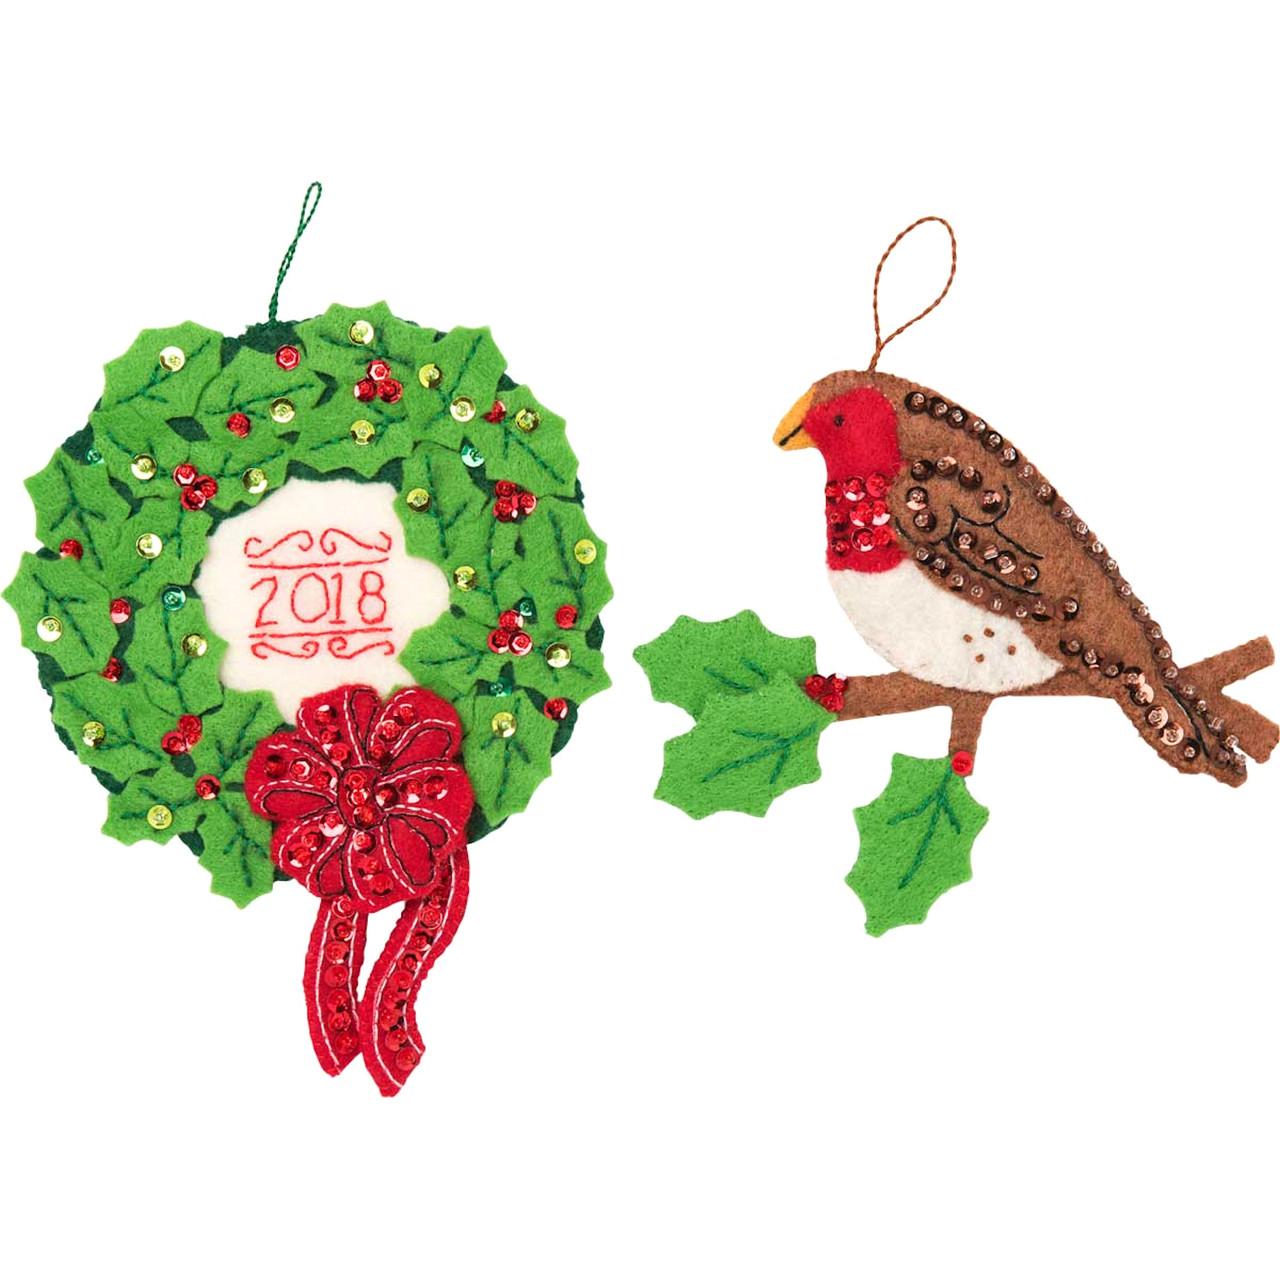 Plaid / Bucilla - Tis The Season Ornaments